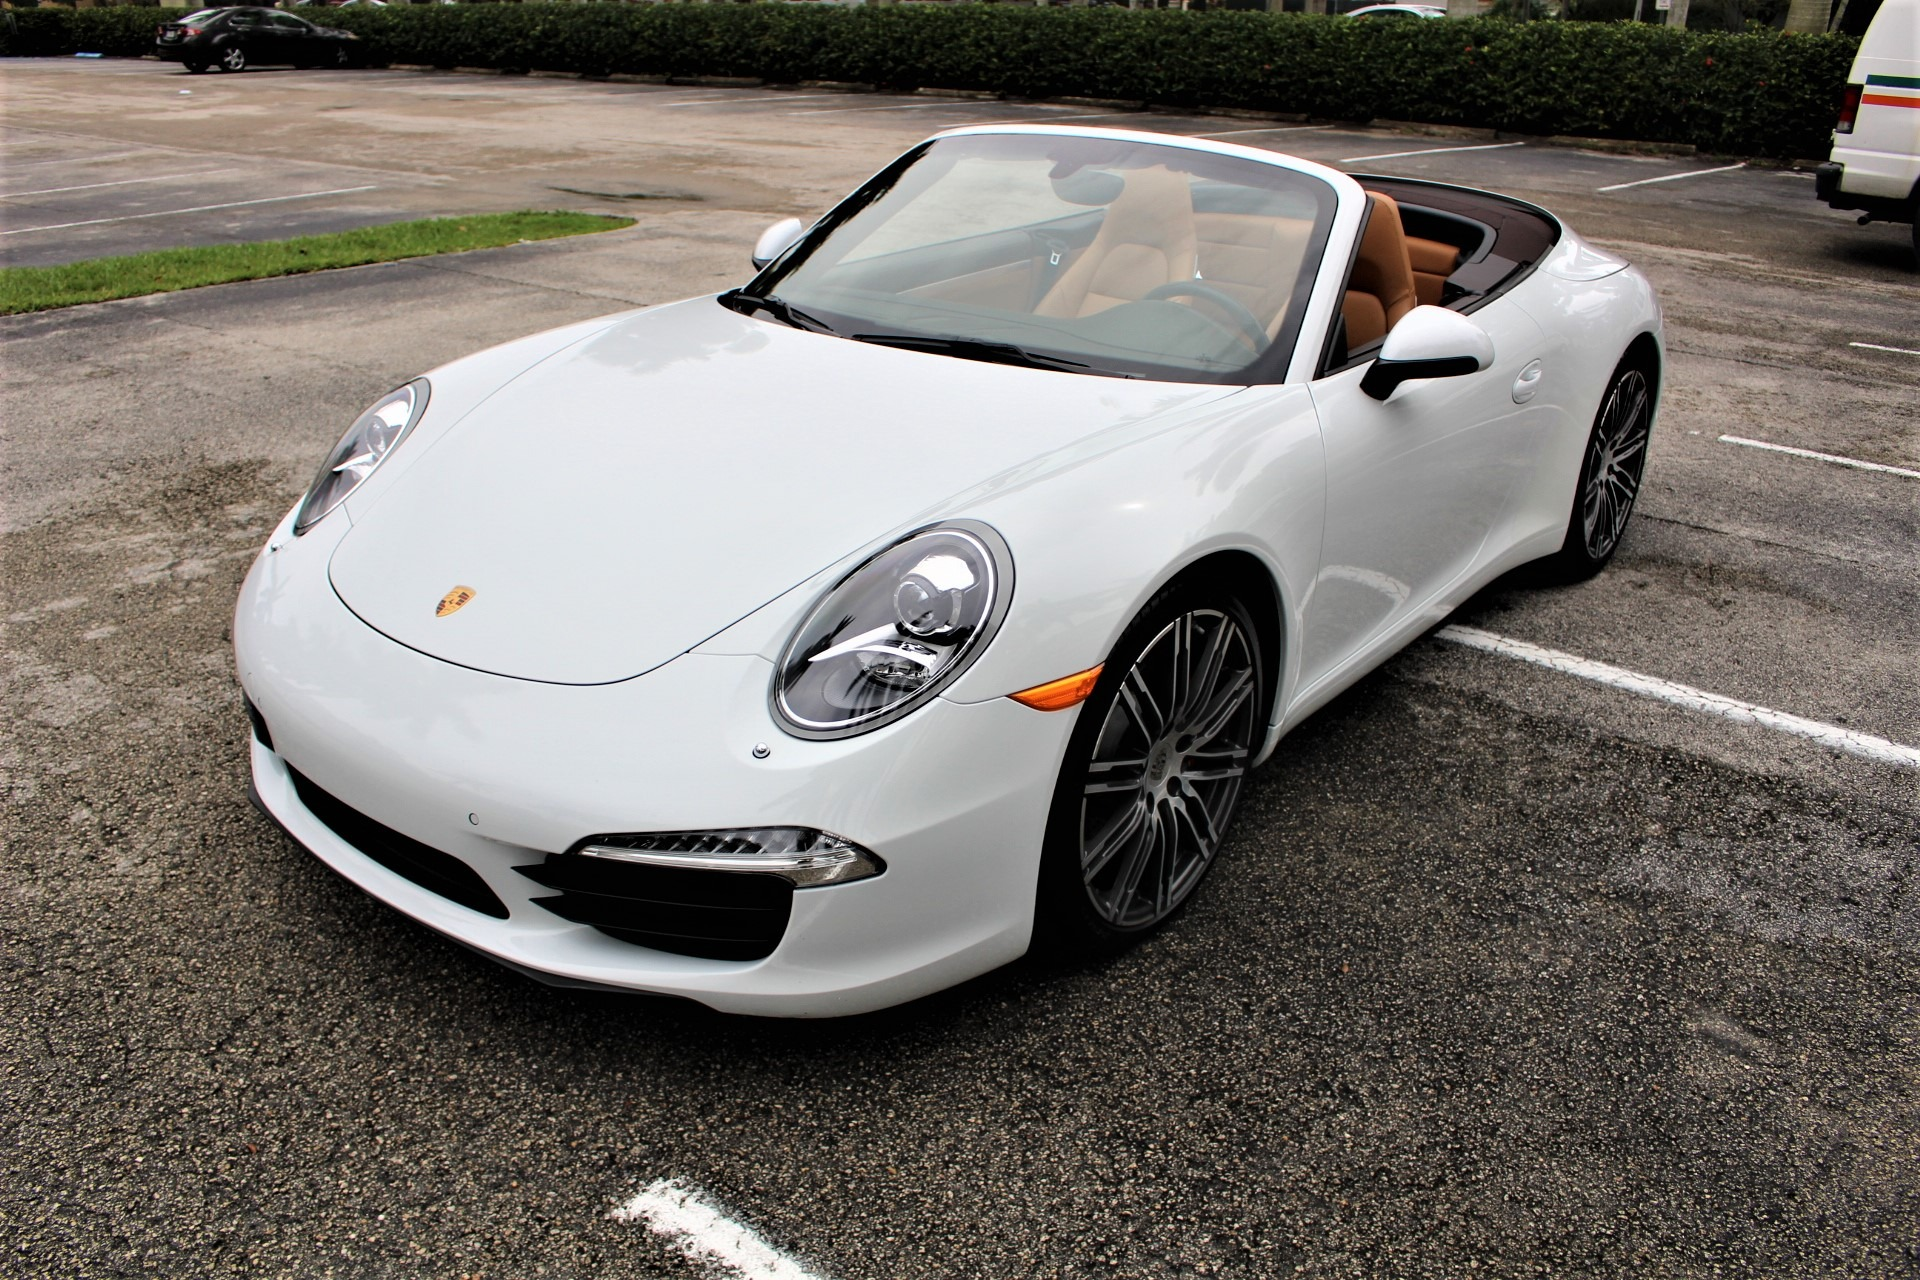 Used 2016 Porsche 911 Carrera S for sale $104,850 at The Gables Sports Cars in Miami FL 33146 4